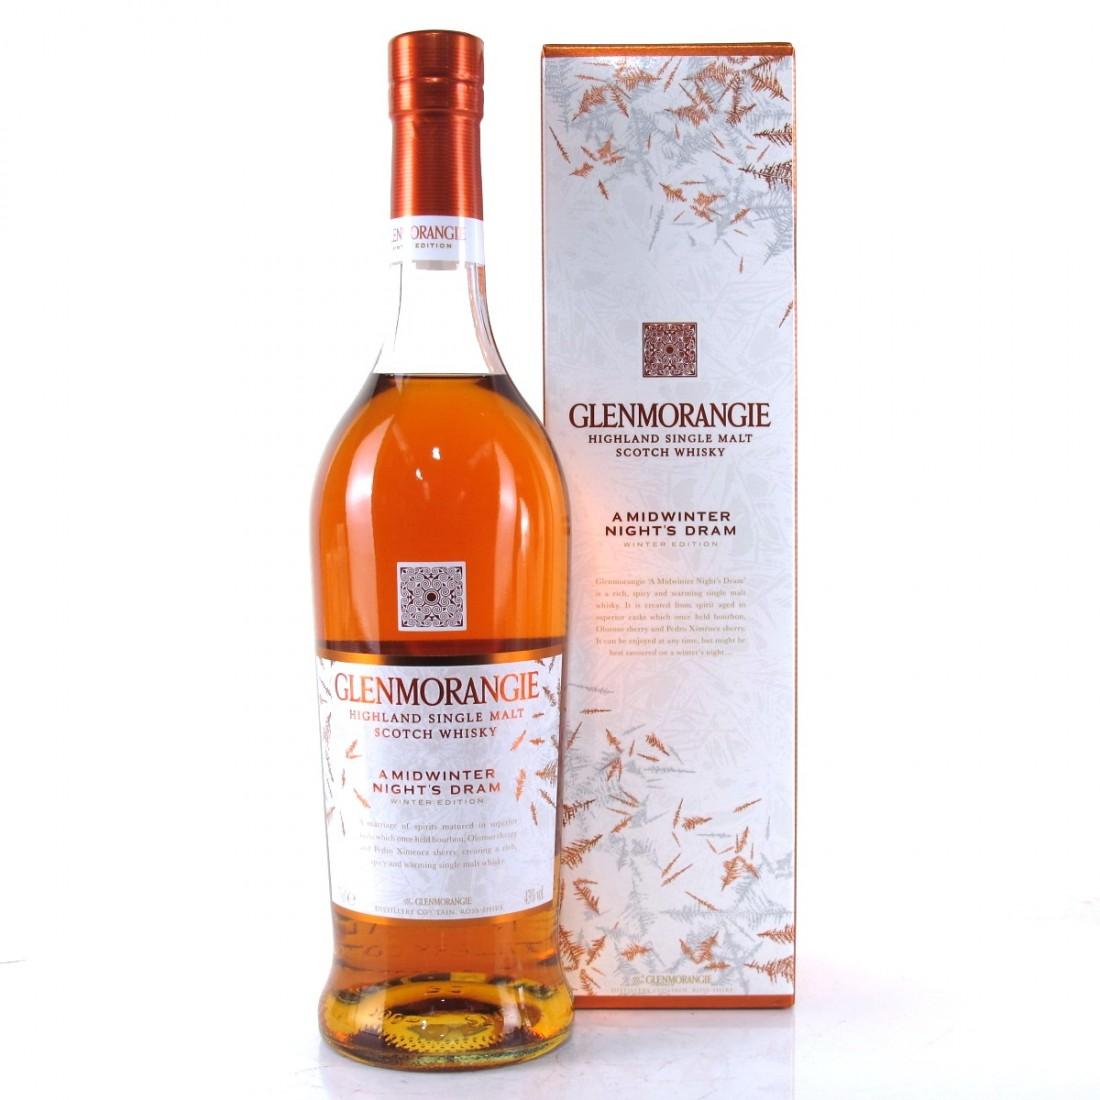 Glenmorangie A Midwinter Night's Dram 2017 Release